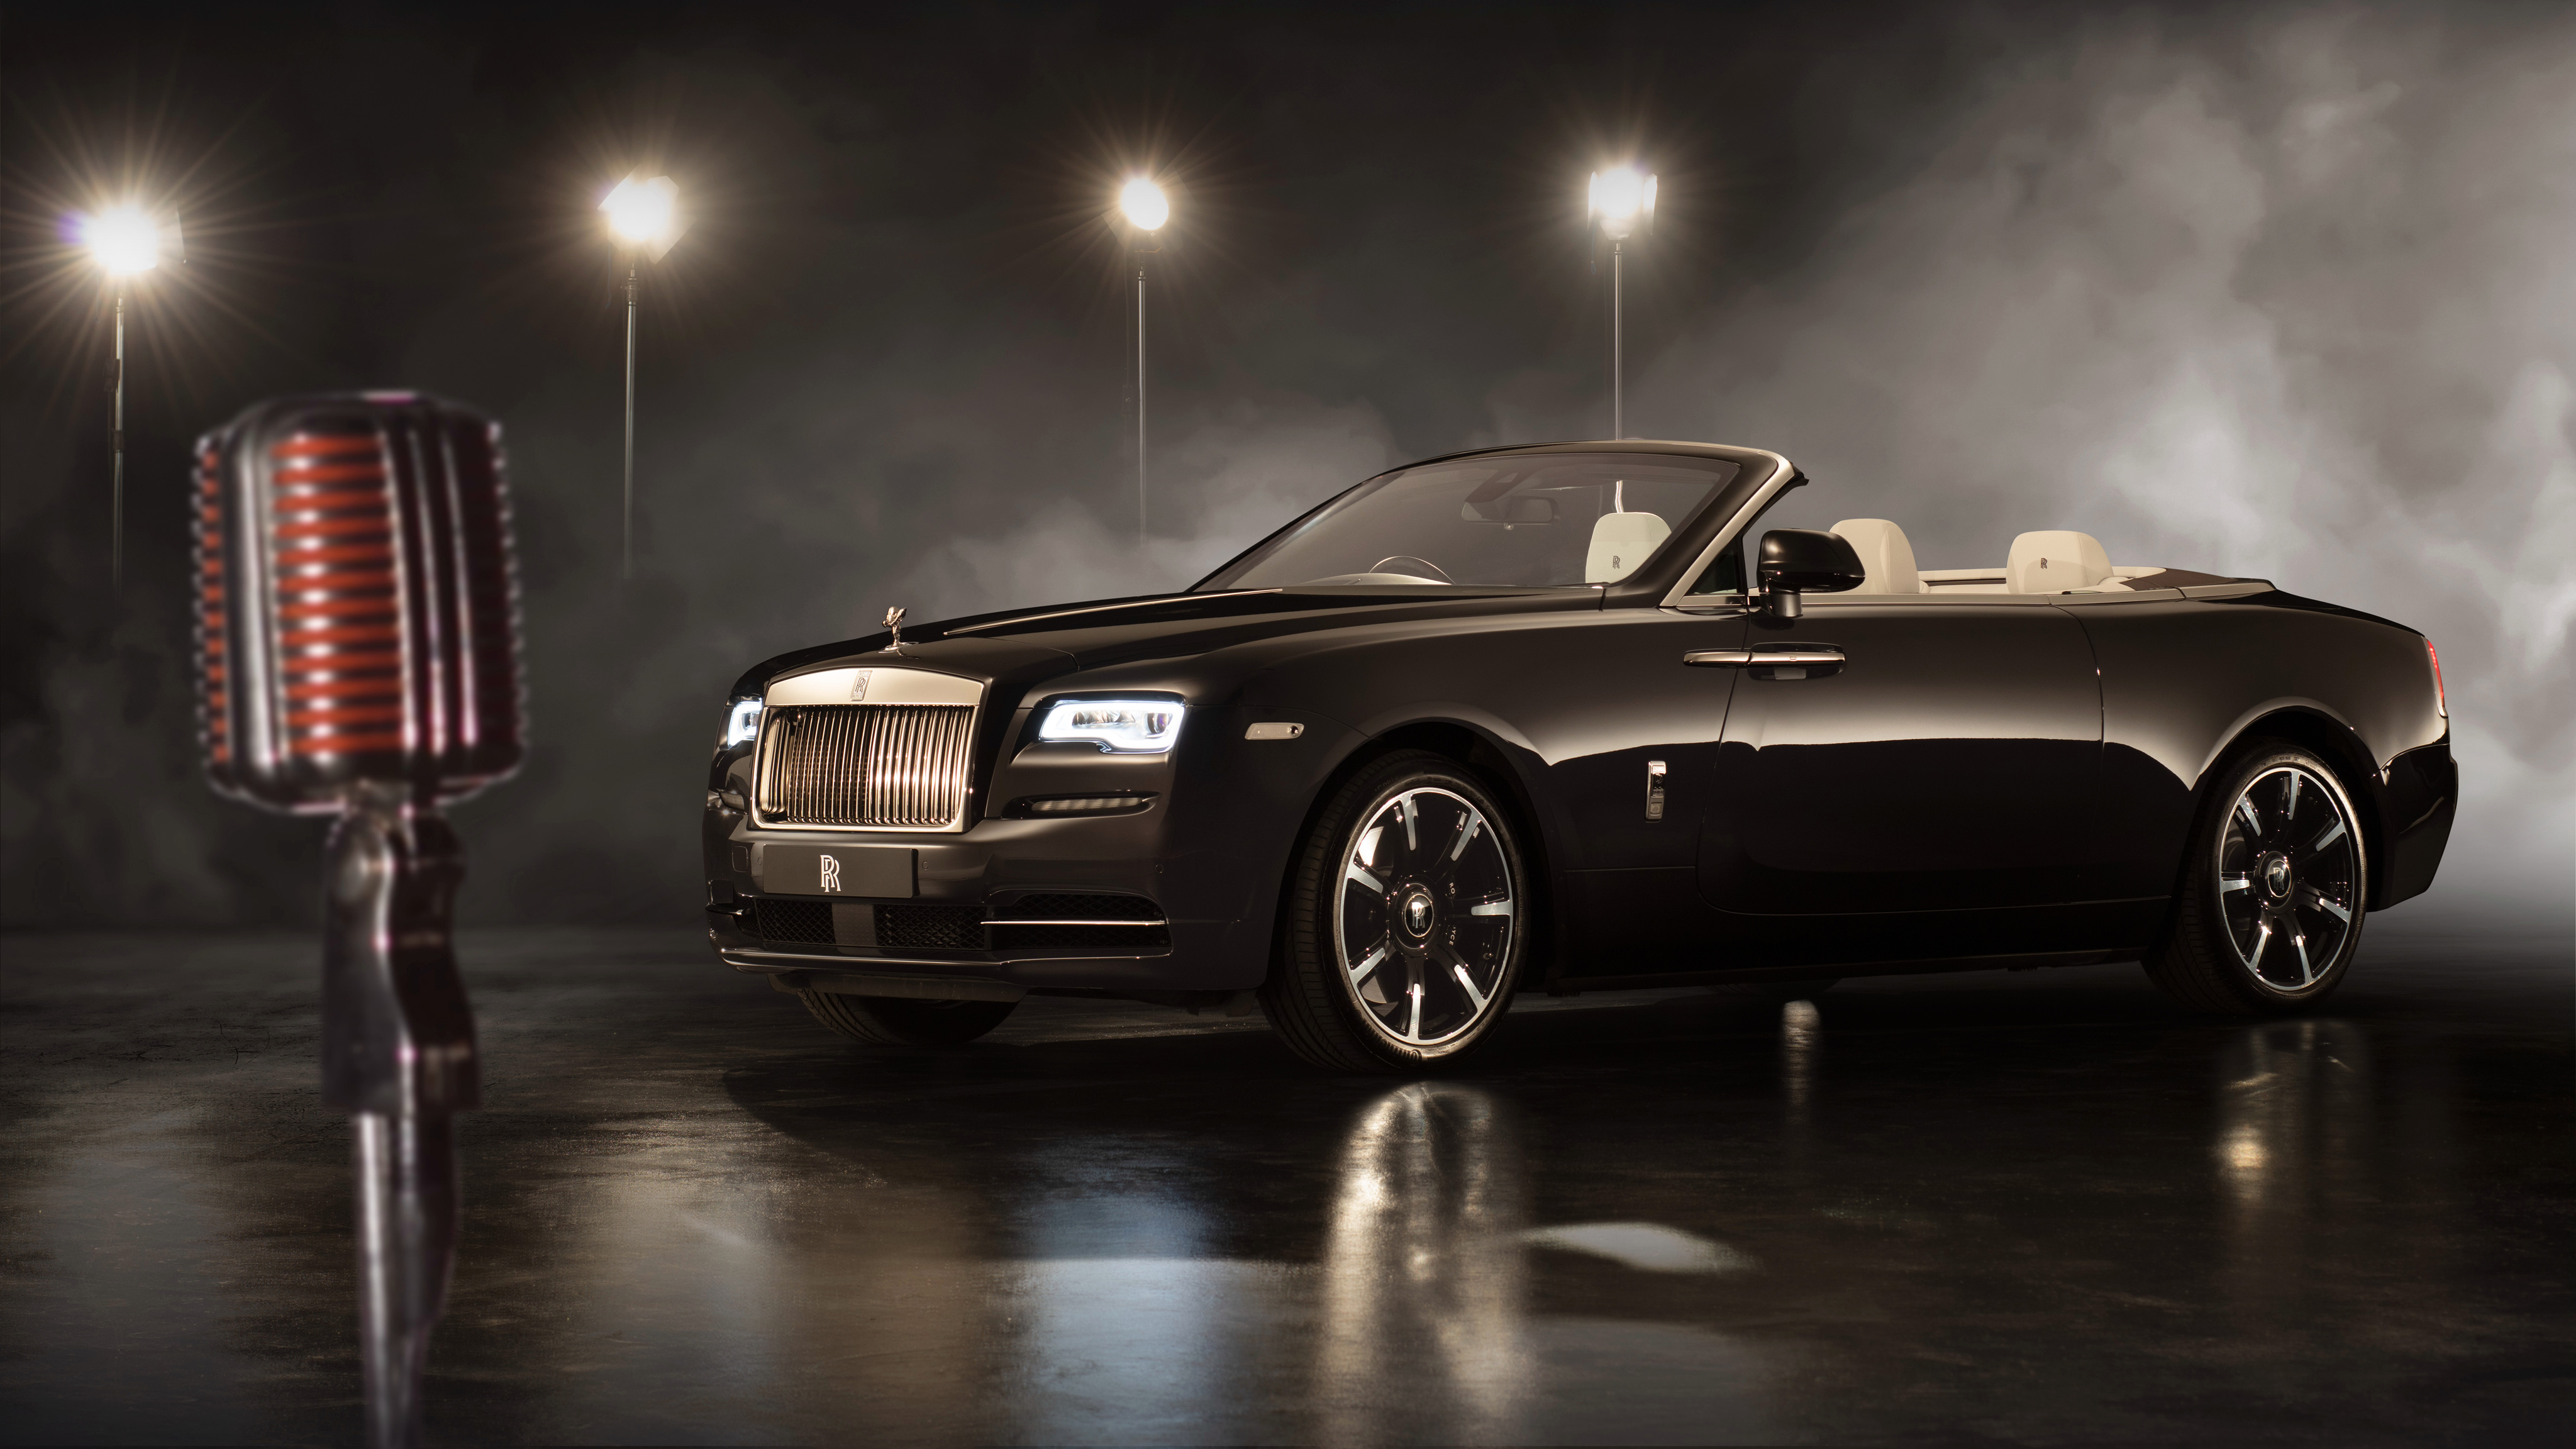 Rolls Royce Dawn Inspired By Music 2018 4k Wallpaper Hd